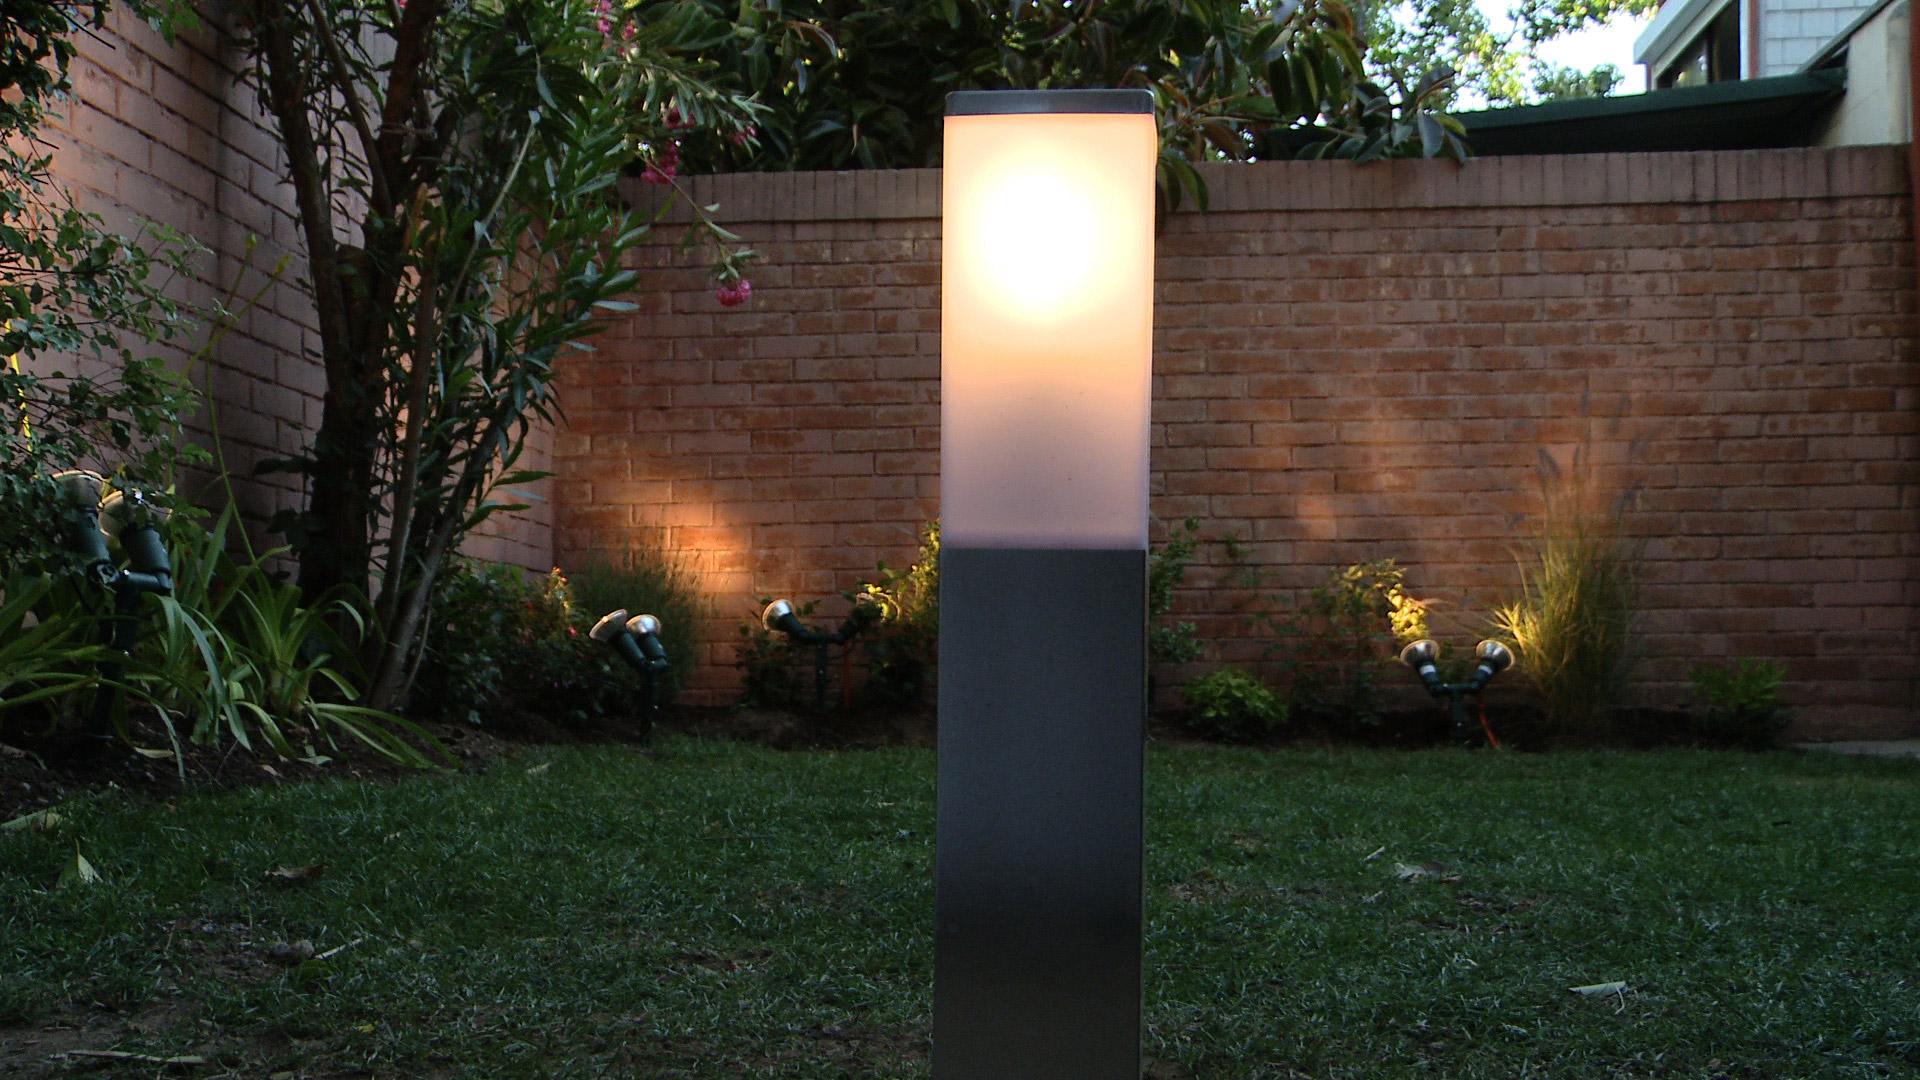 H galo usted mismo c mo instalar luces en el jard n - Luces de led para exterior ...